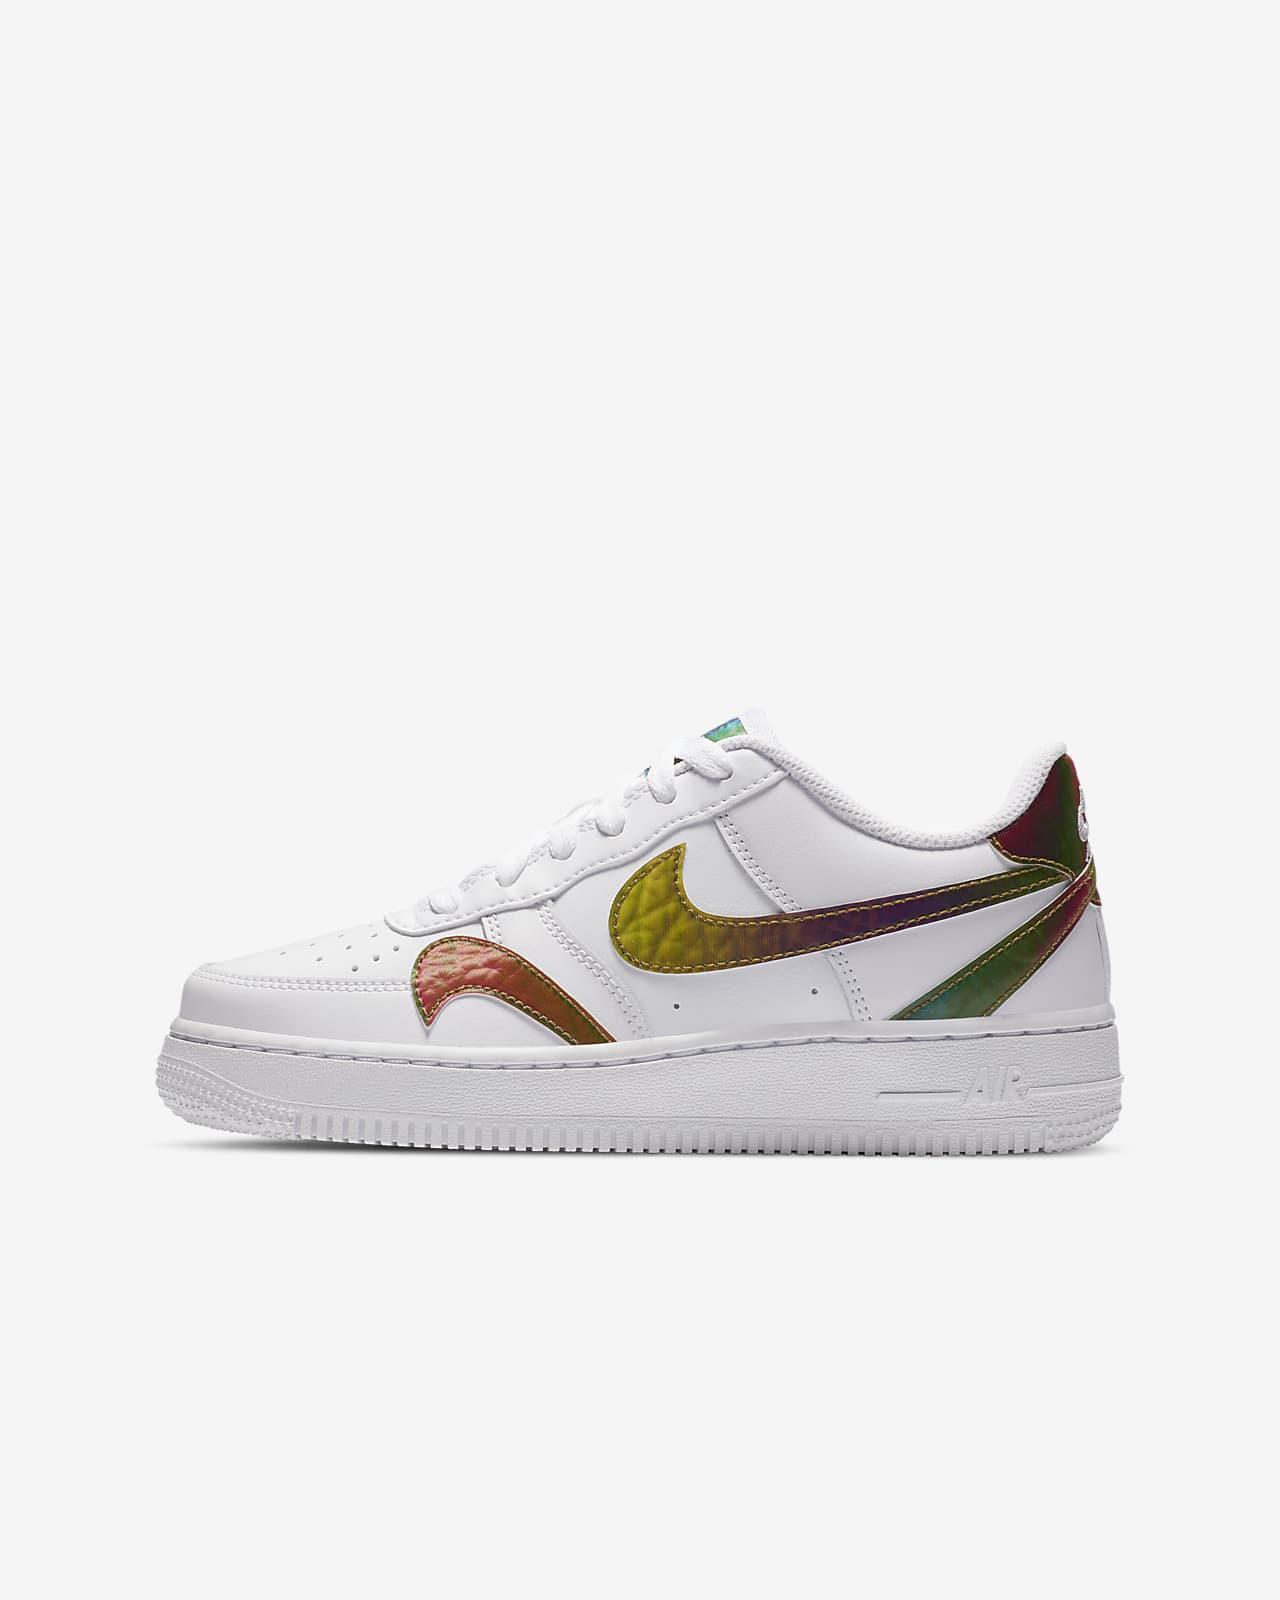 Nike Air Force 1 LV8 2 Older Kids' Shoe